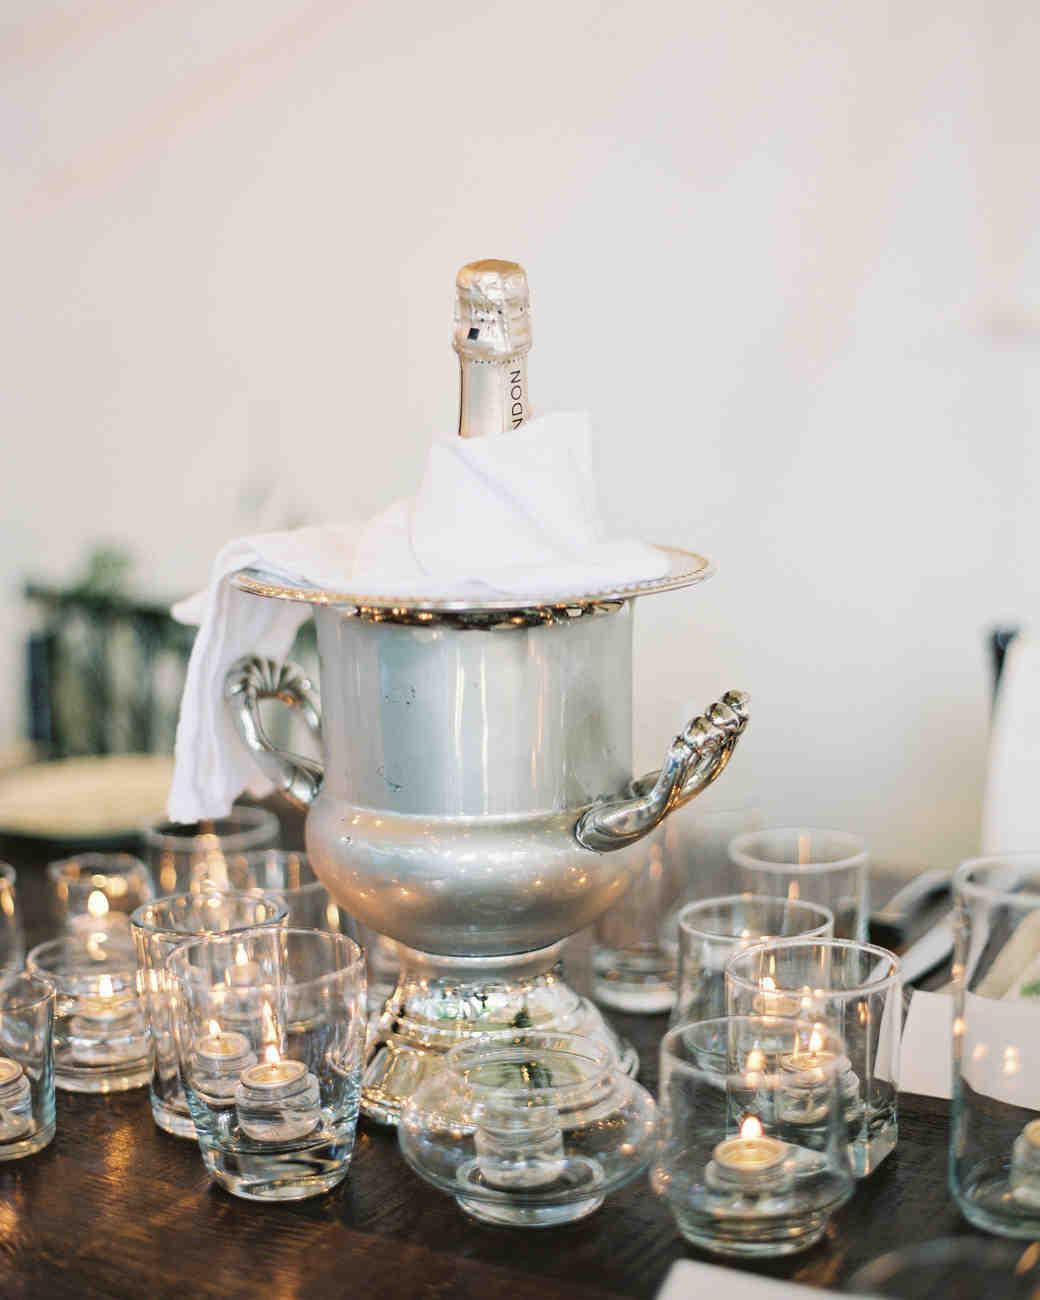 mackenzie-ian-wedding-champagne-063-s112461-0116.jpg